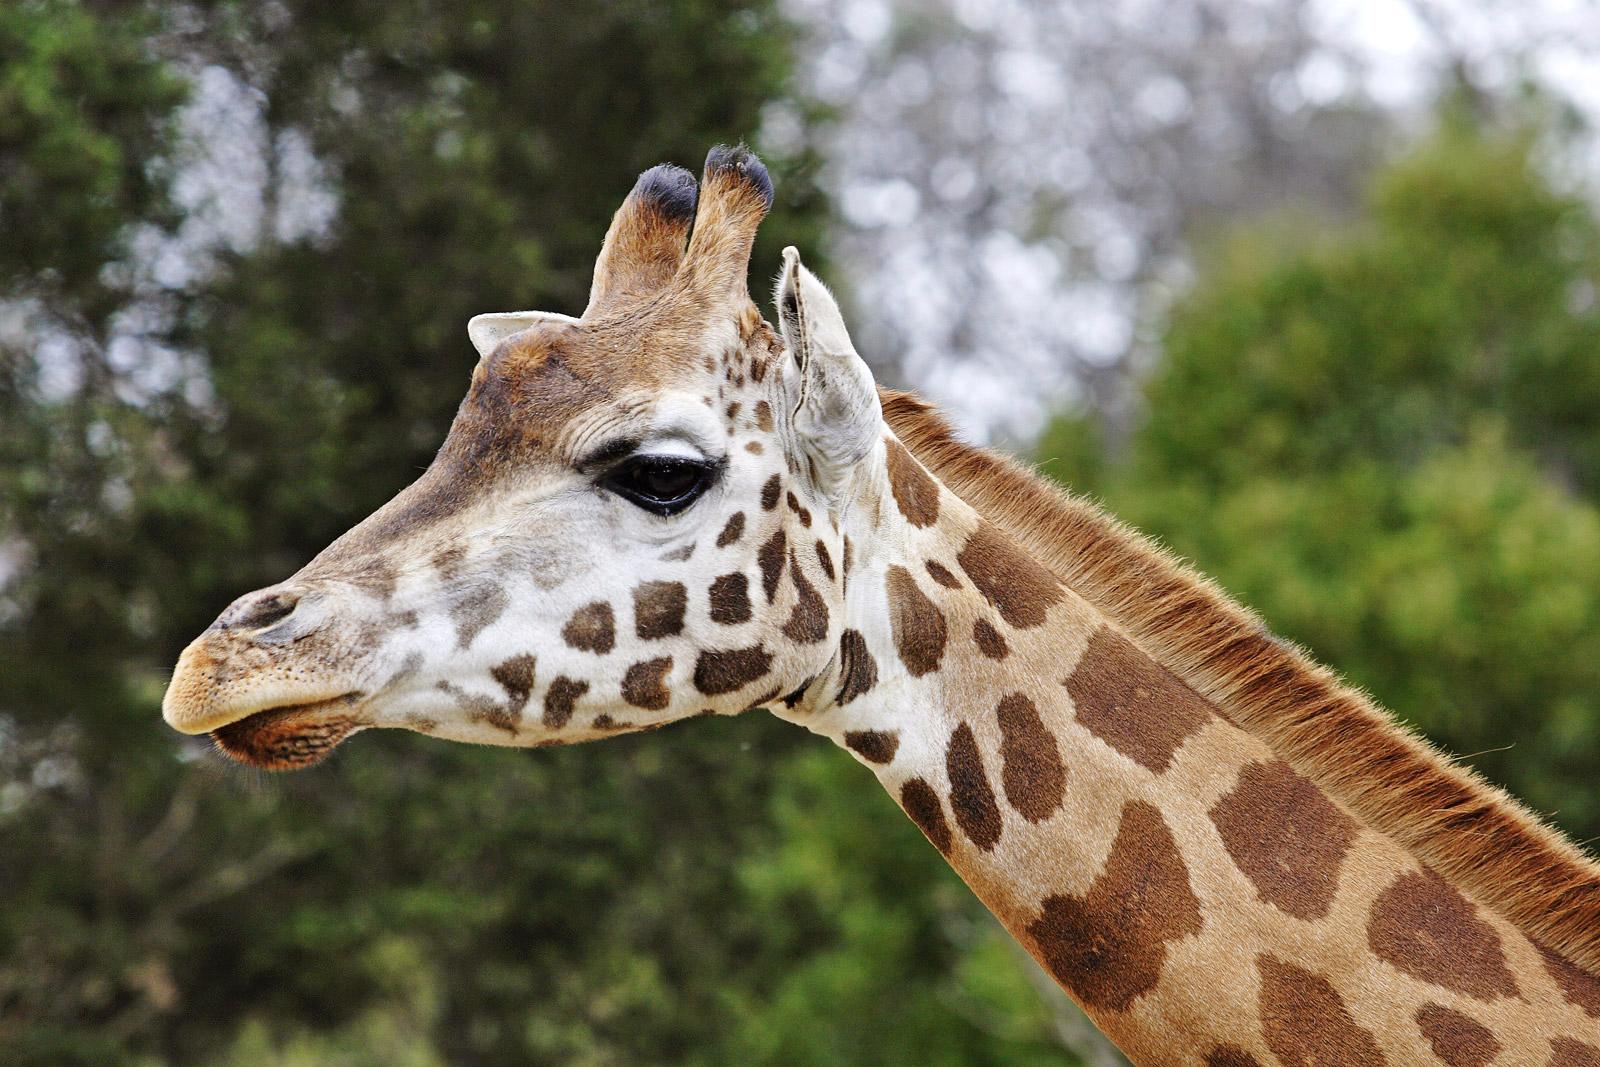 Closeup of the head of a giraffe (Giraffa camelopardalis), at the Melbourne Zoo, Australia.